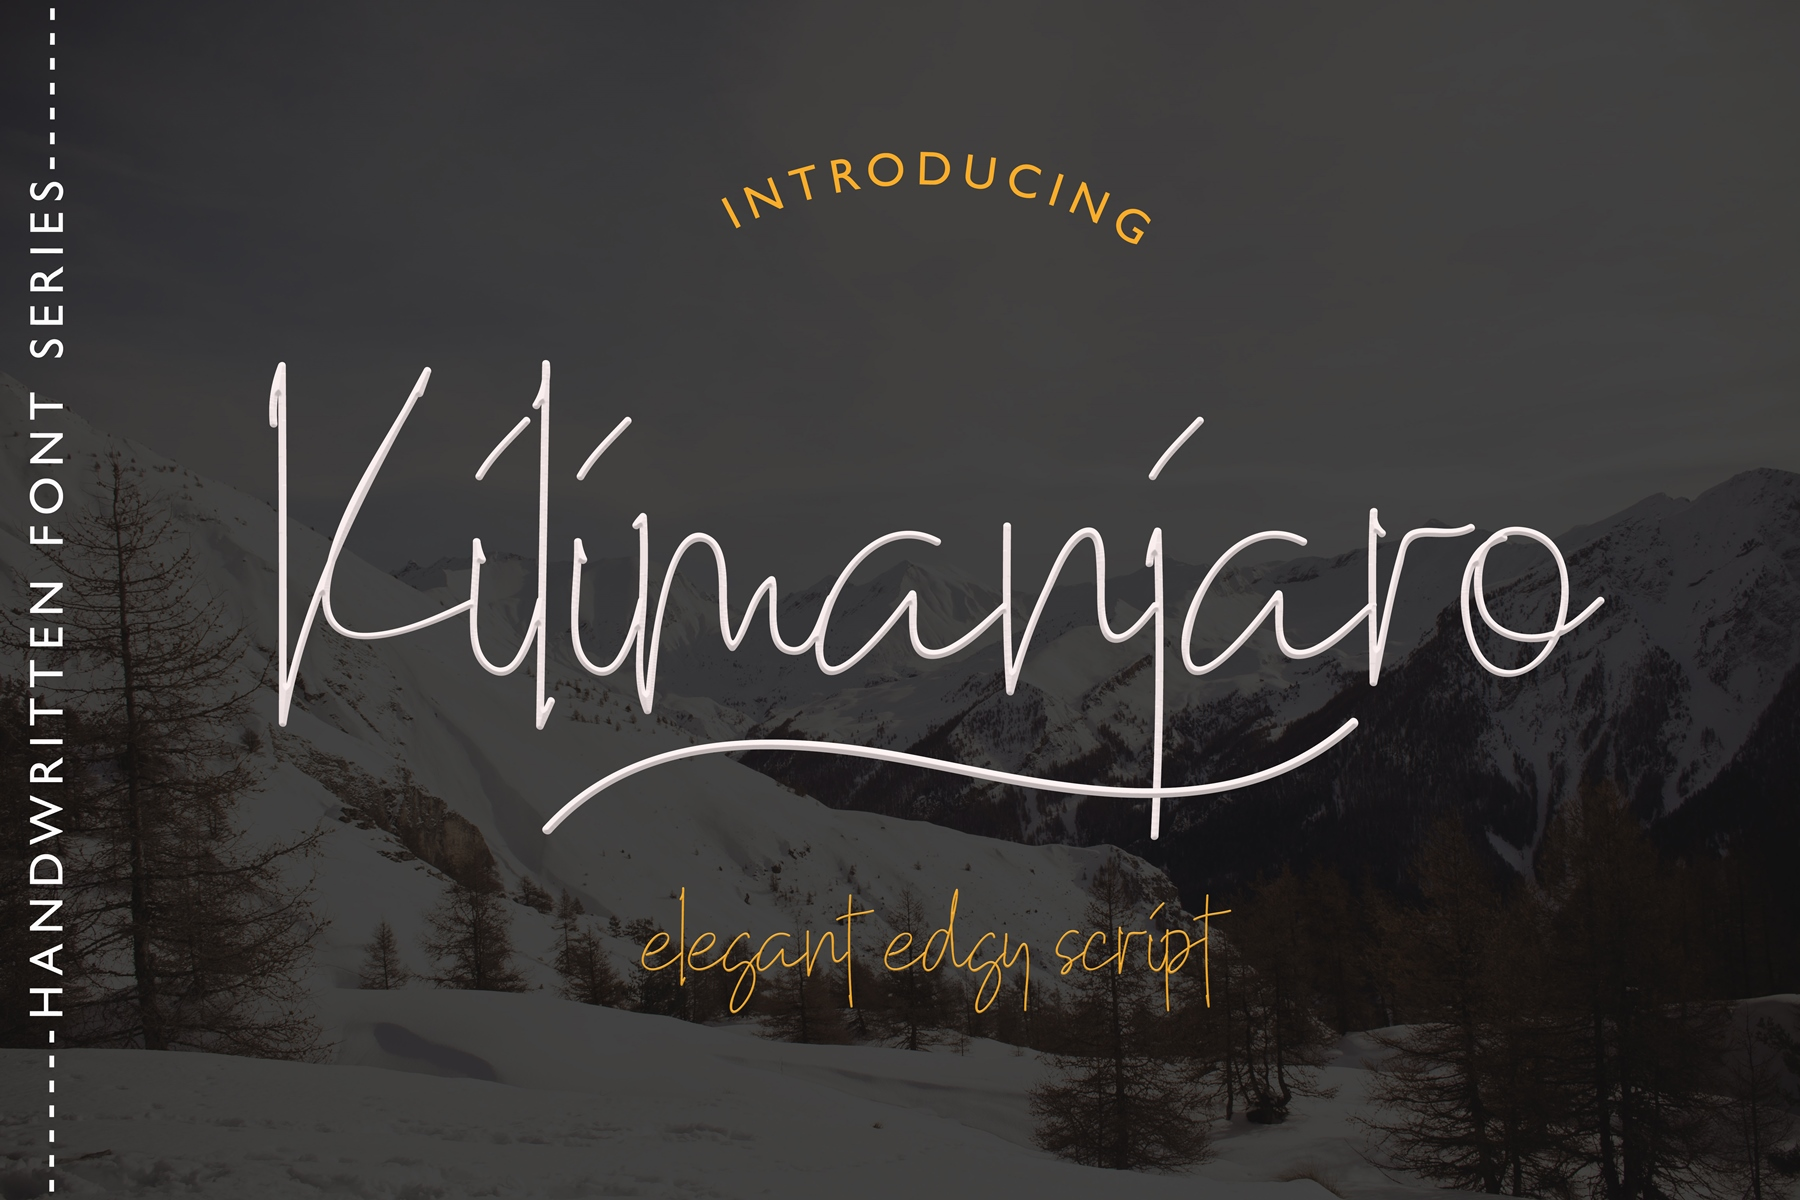 Kilimanjaro example image 1